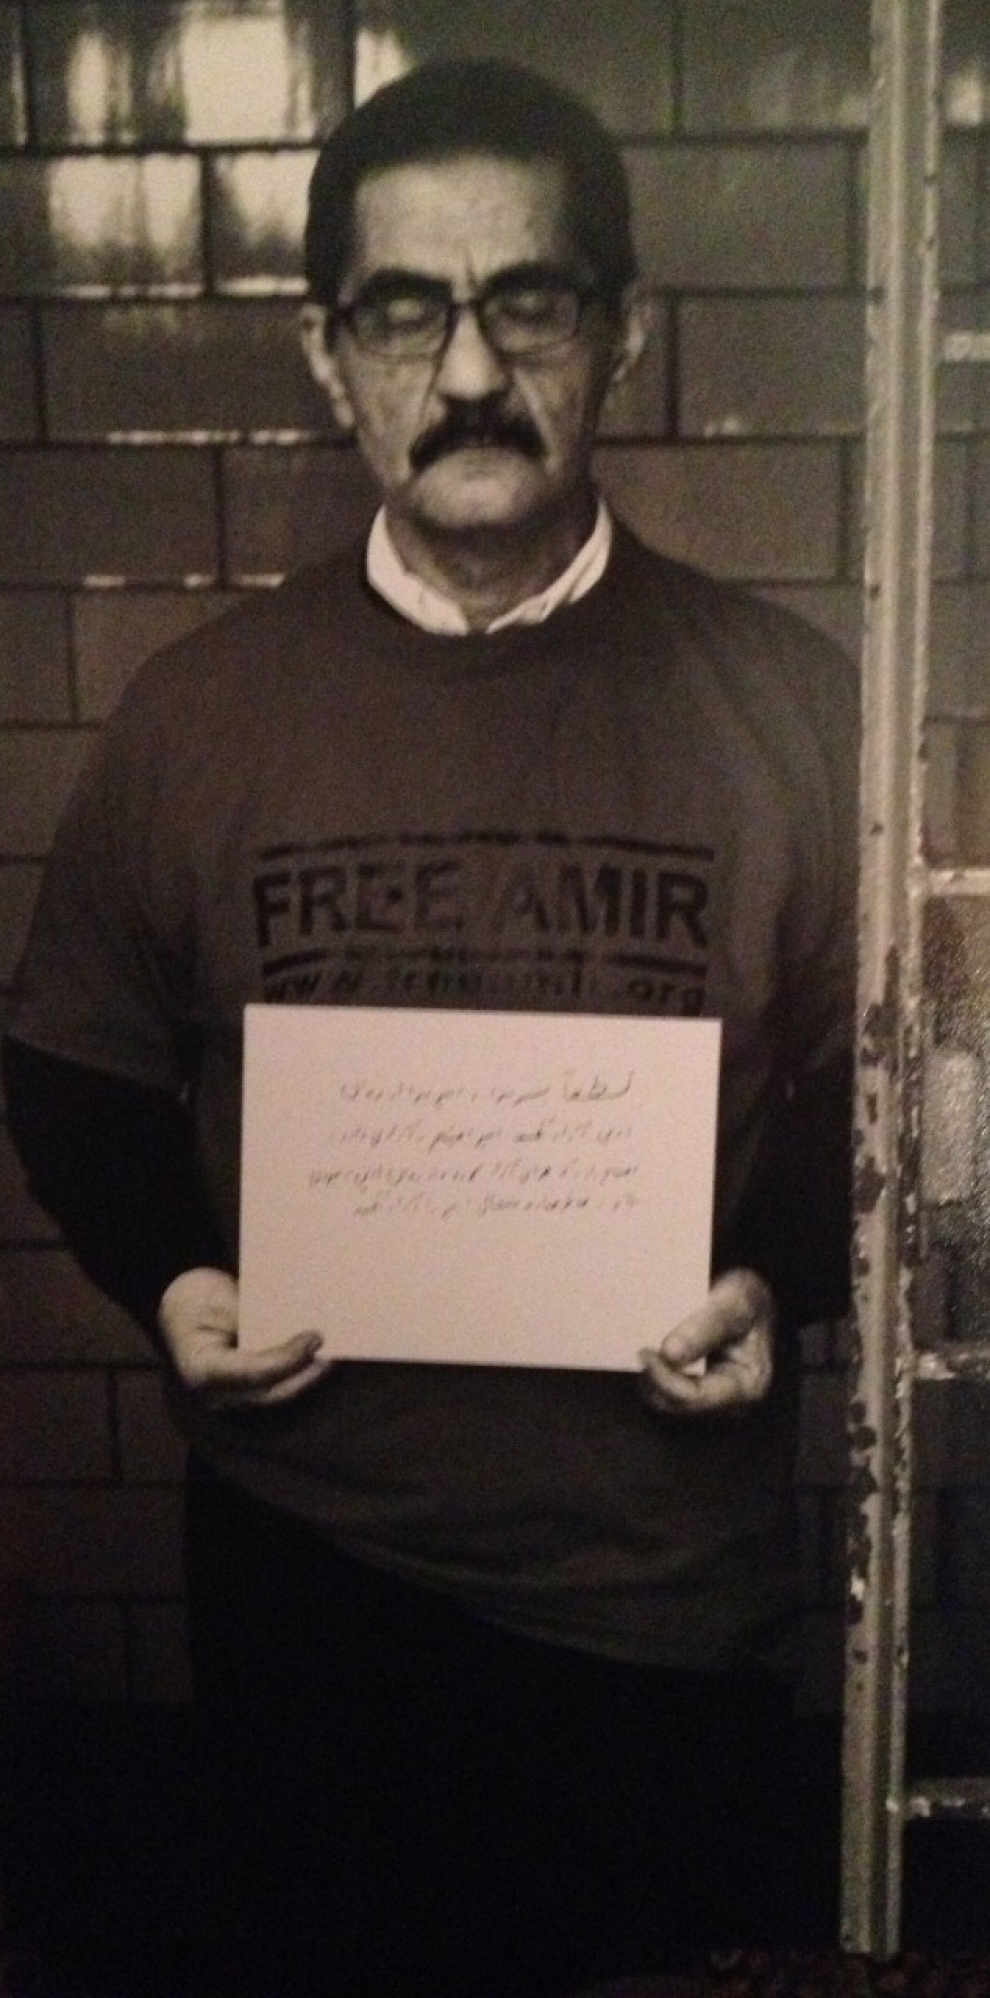 Amir Ali Said Amir Hekmati's Father Ali